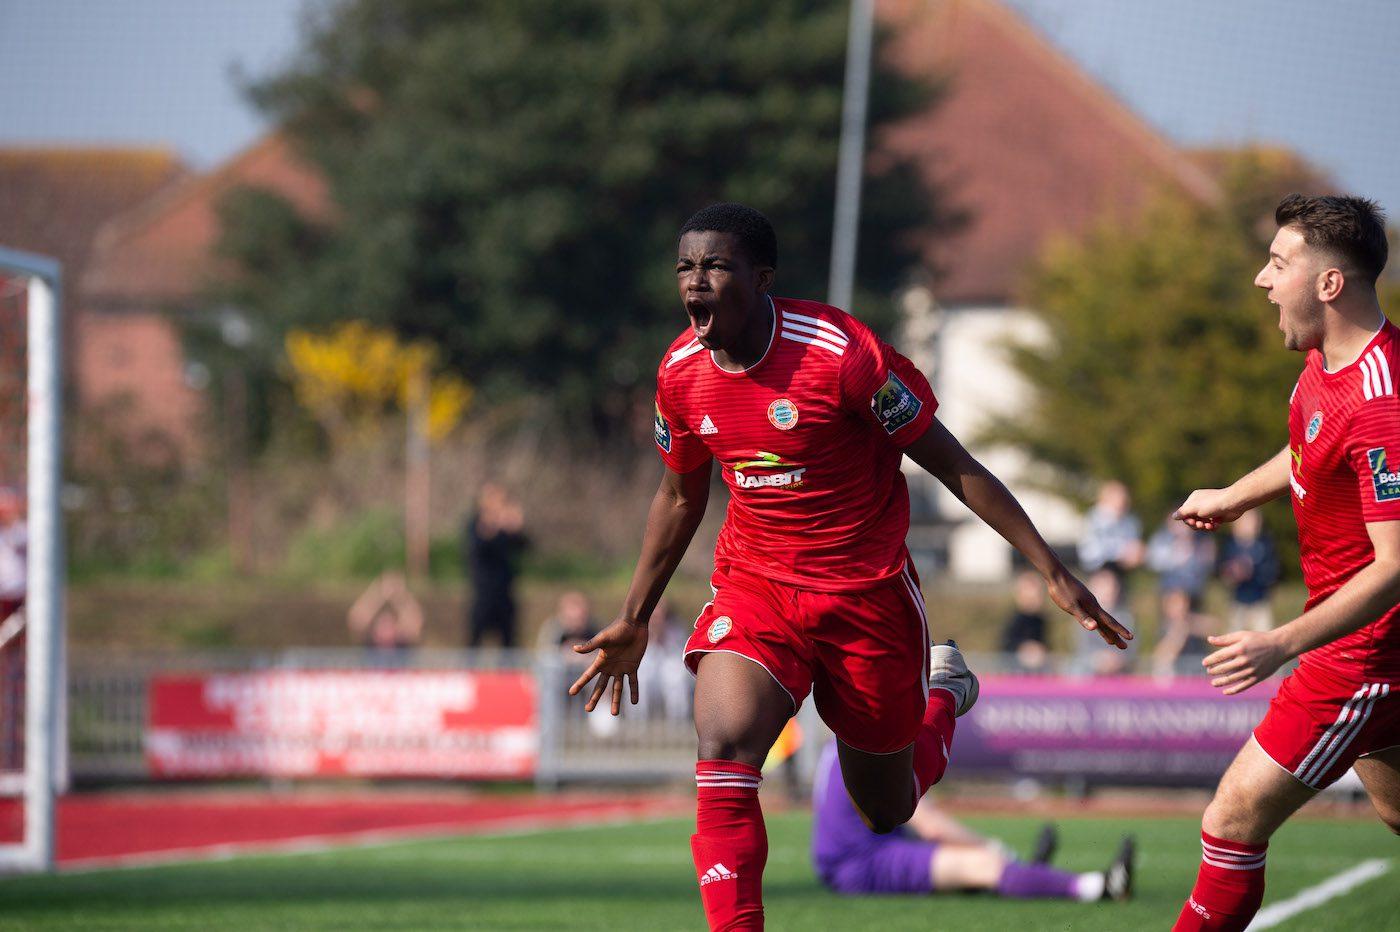 Kwame Poku celebrates scoring against Hornchurch at Woodside Road